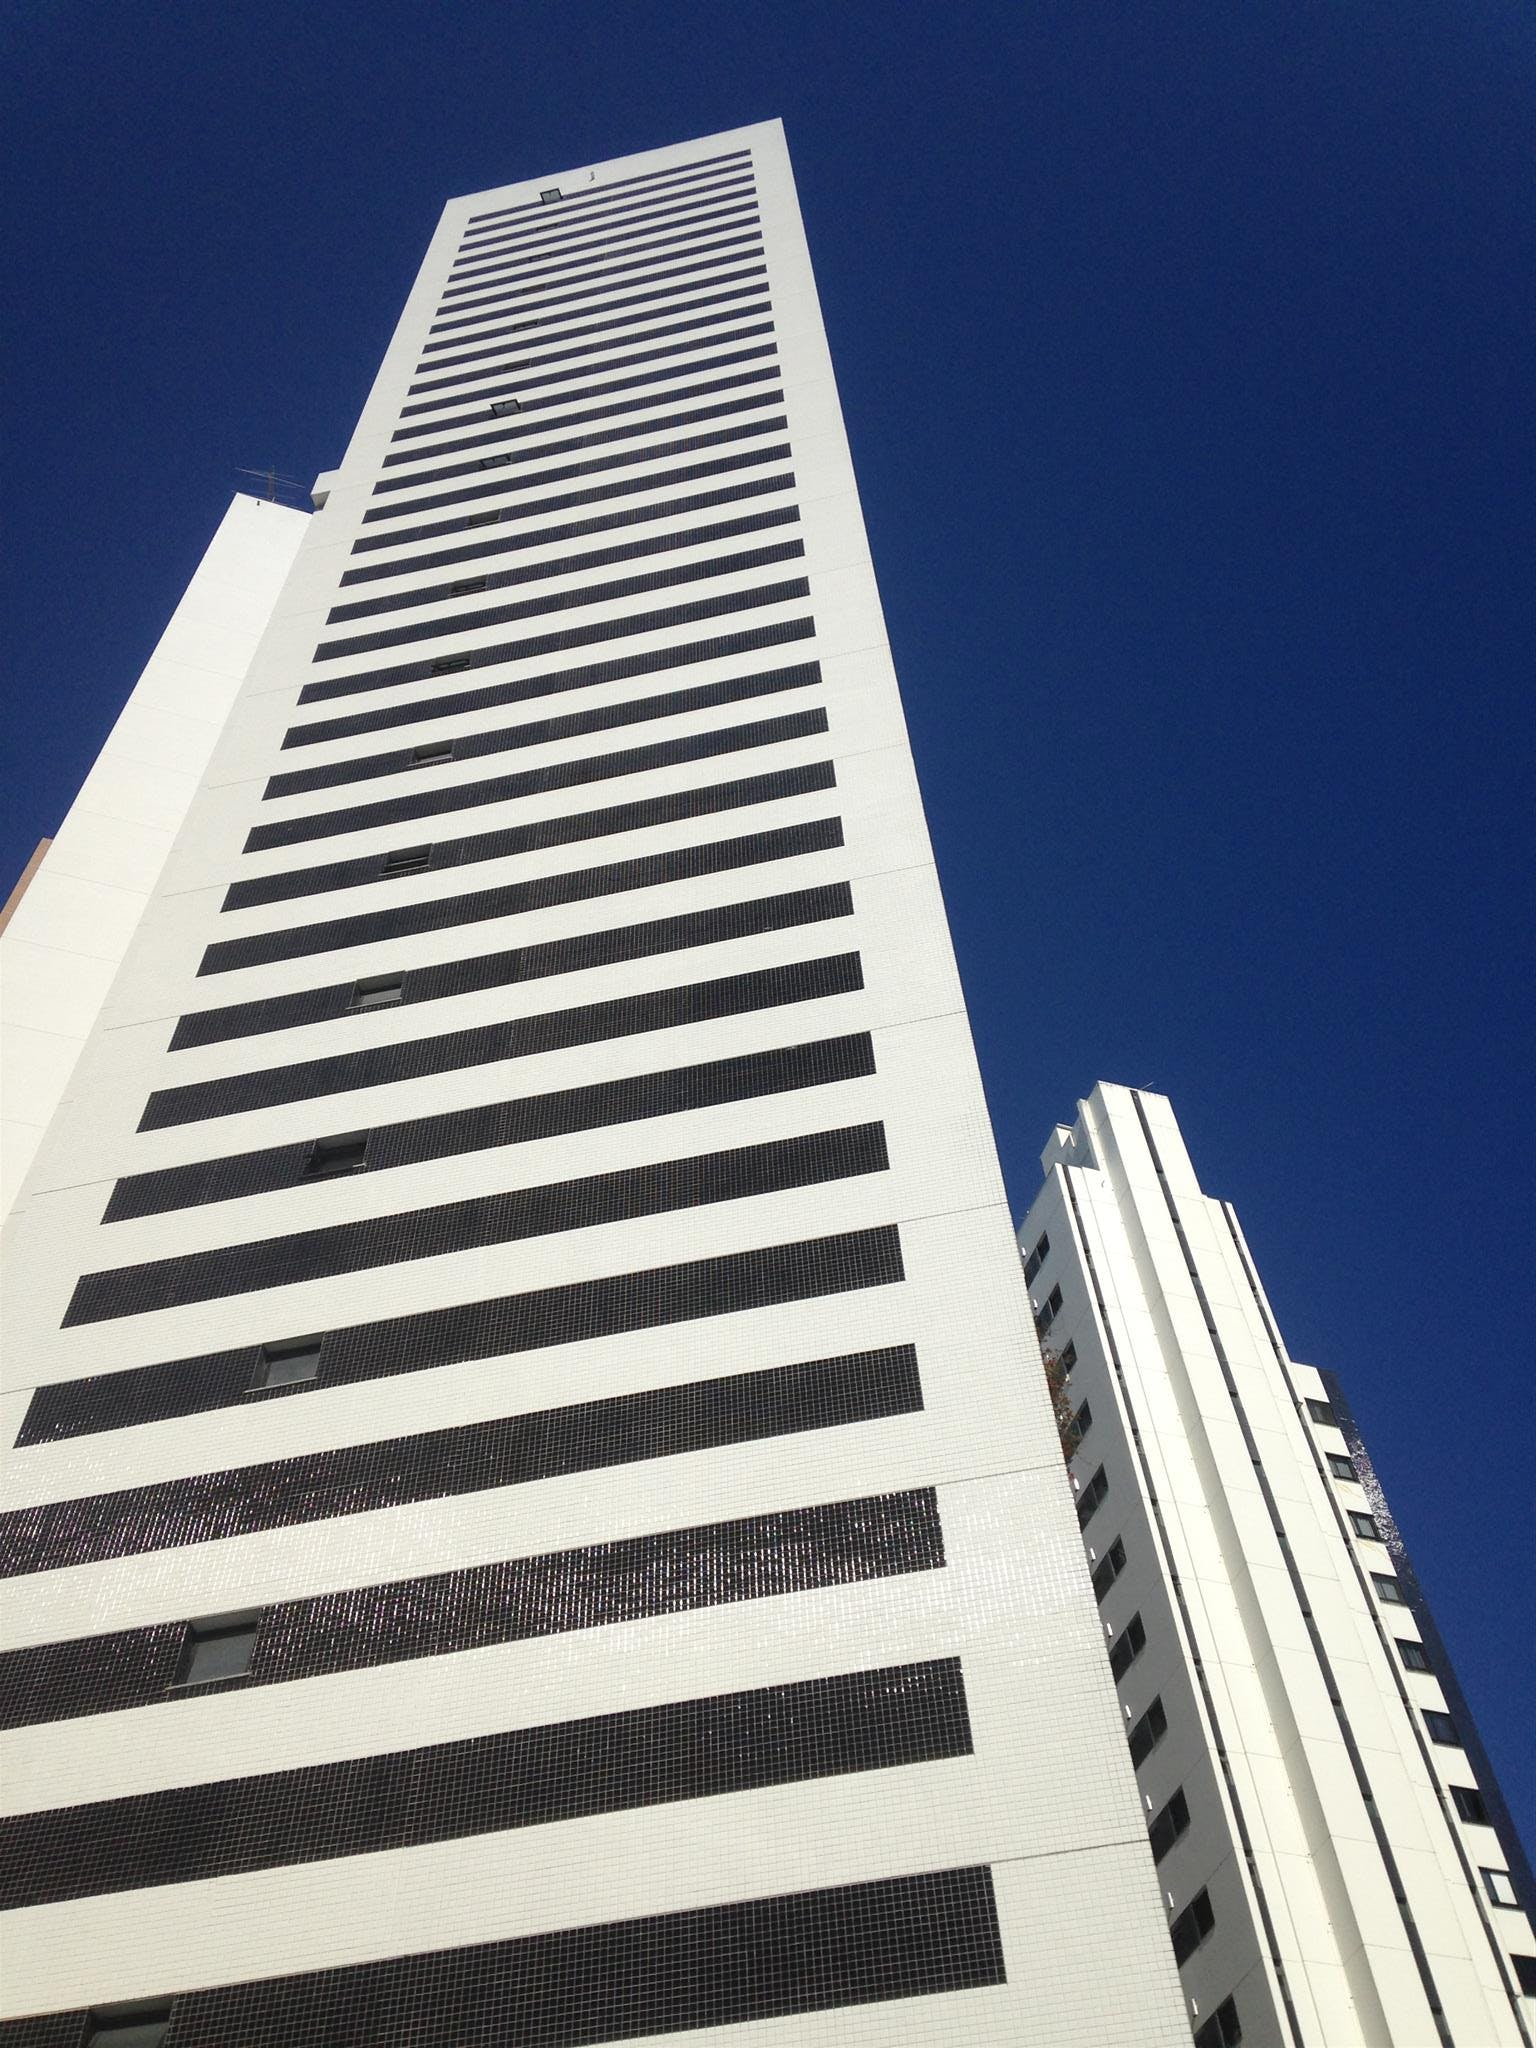 Free stock photo of iphone, buildings, urban, salvador